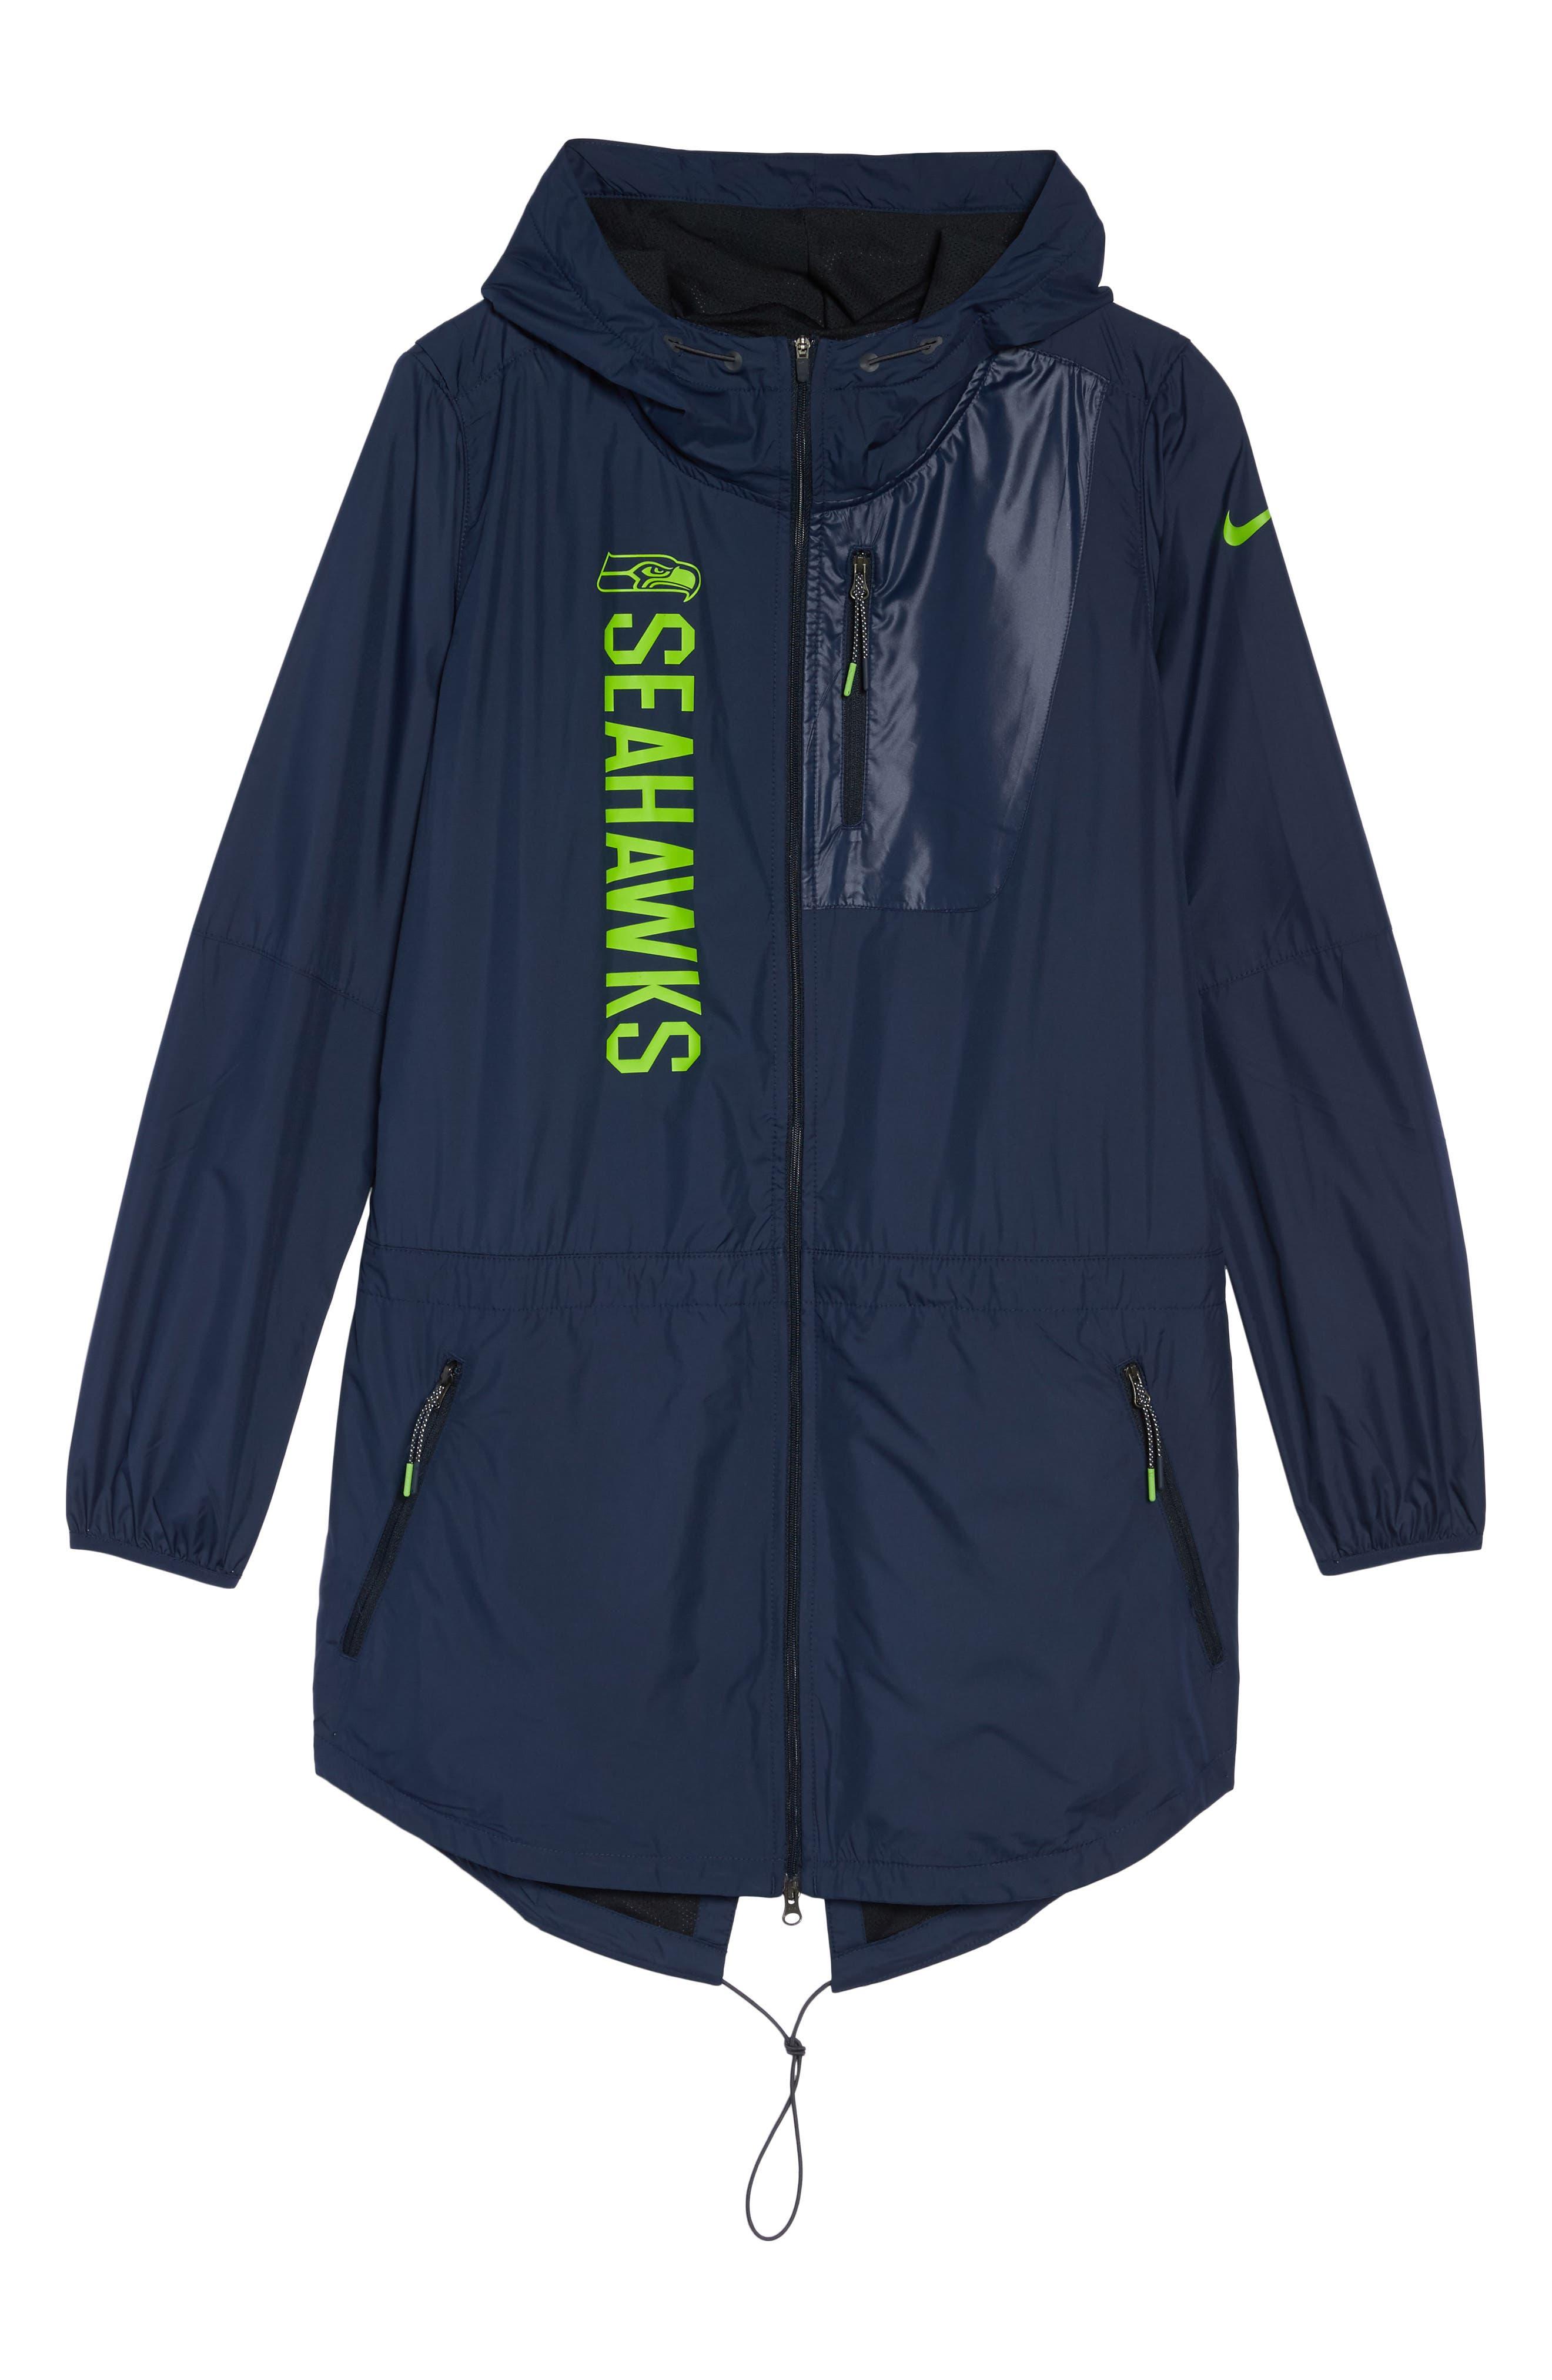 NFL Packable Water Resistant Jacket,                             Alternate thumbnail 7, color,                             College Navy/ Seahawks